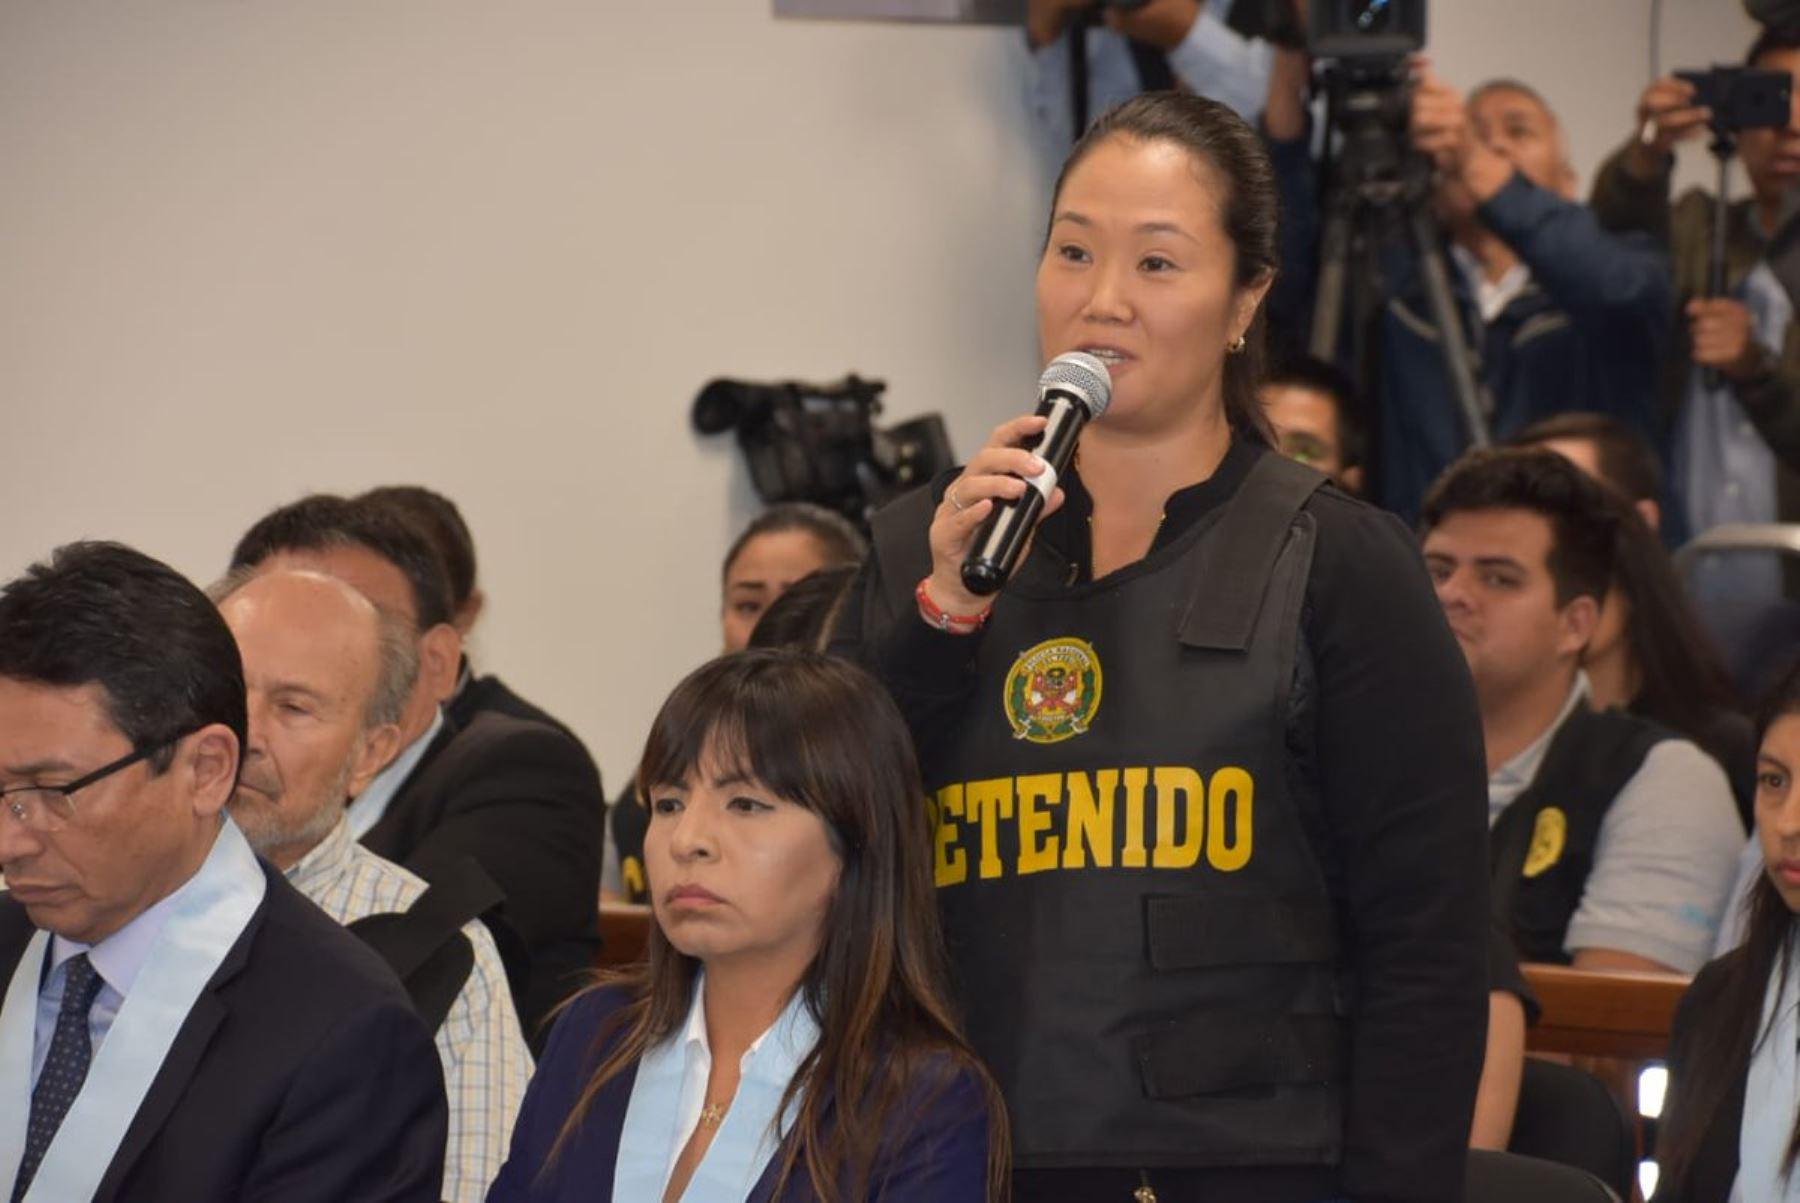 Tribunal Constitucional declaró fundado habeas corpus de Keiko Fujimori; lideresa de Fuerza Popular saldrá en libertad